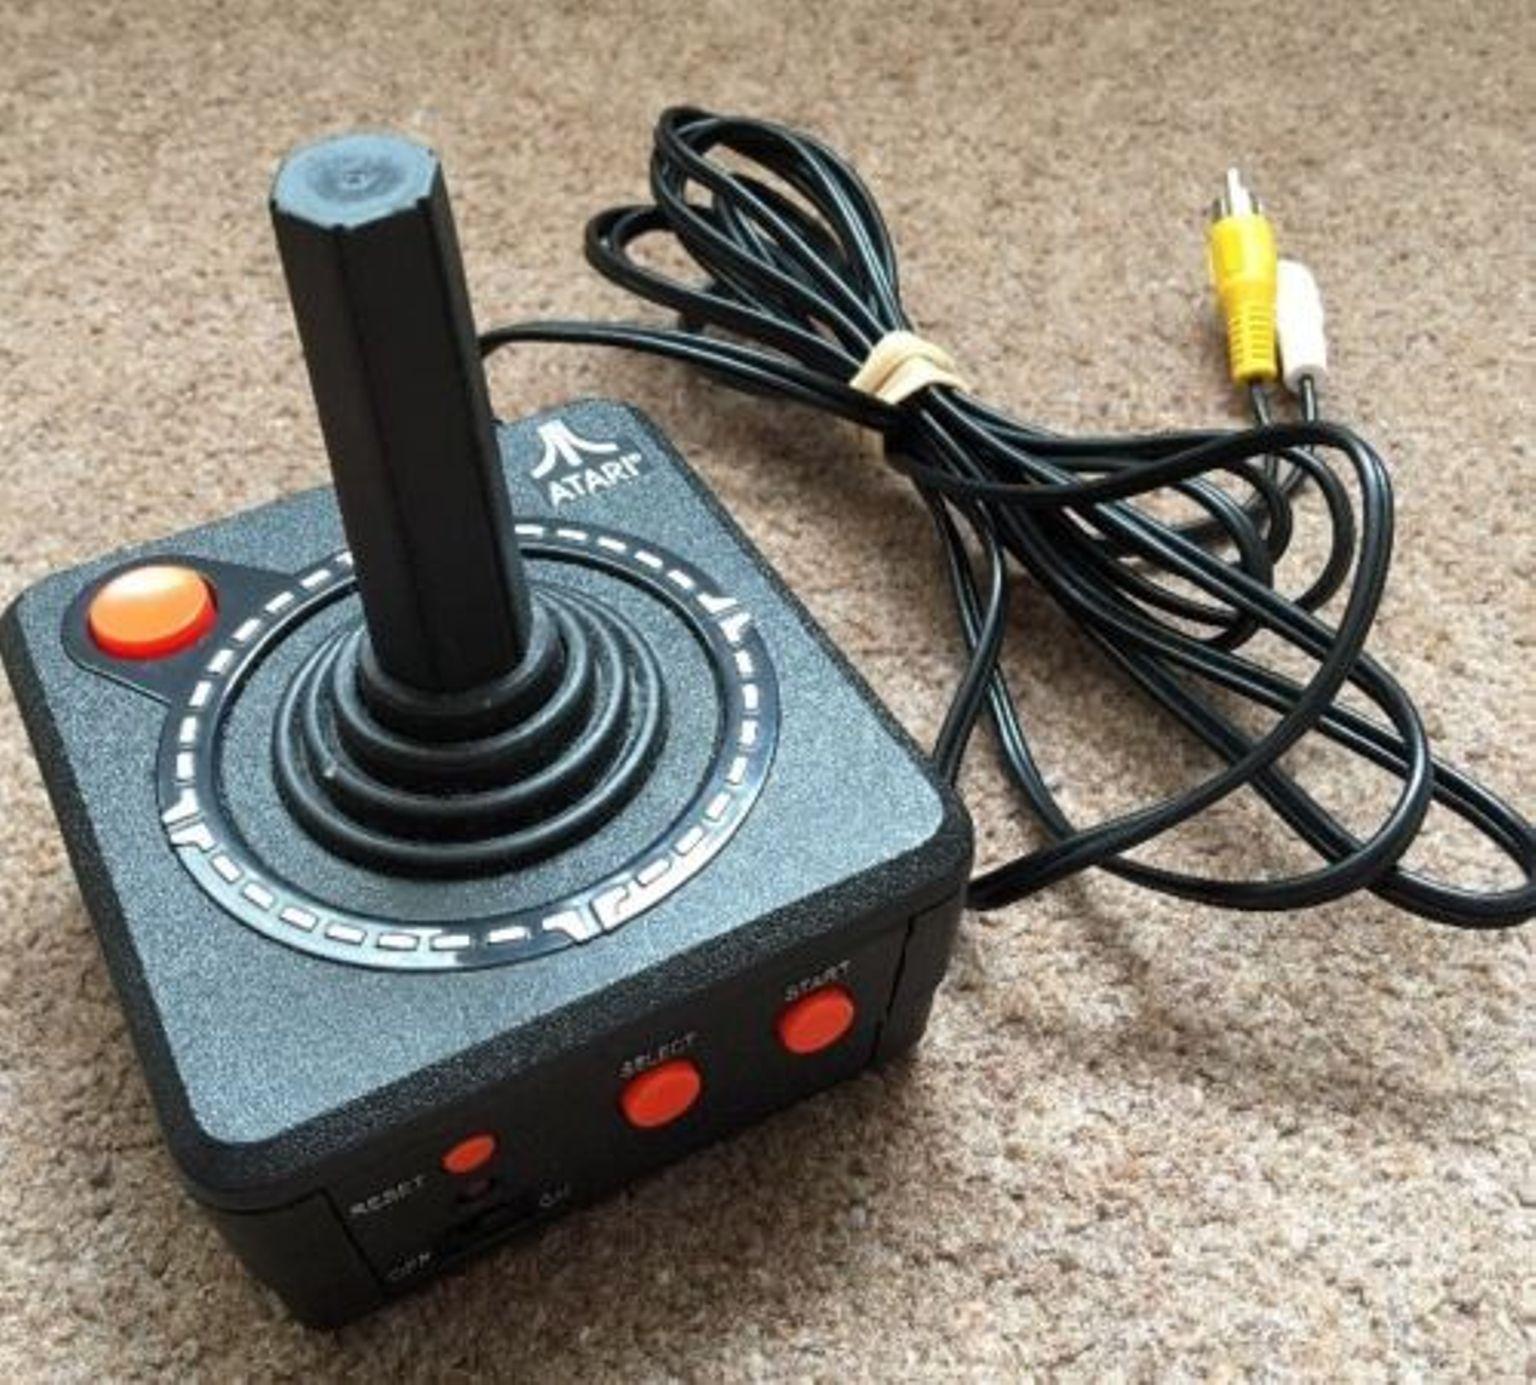 Atari plug play tvgames console joystick just plug in